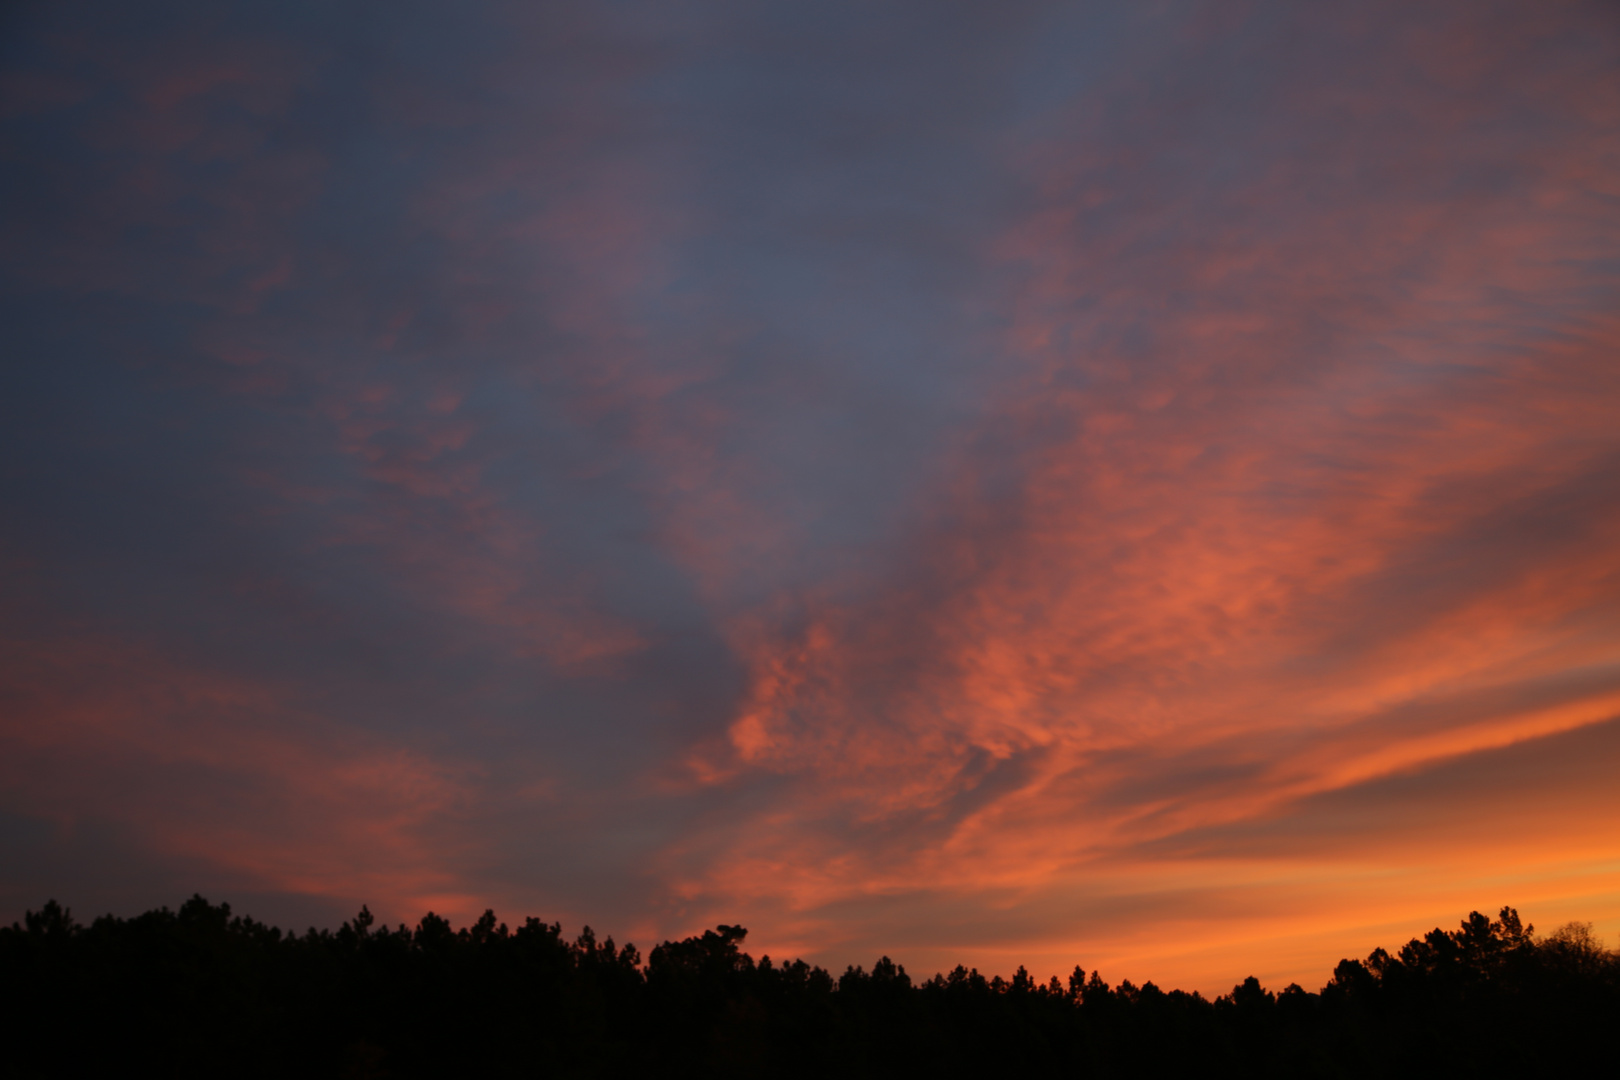 Le ciel est en feu ce matin N°1